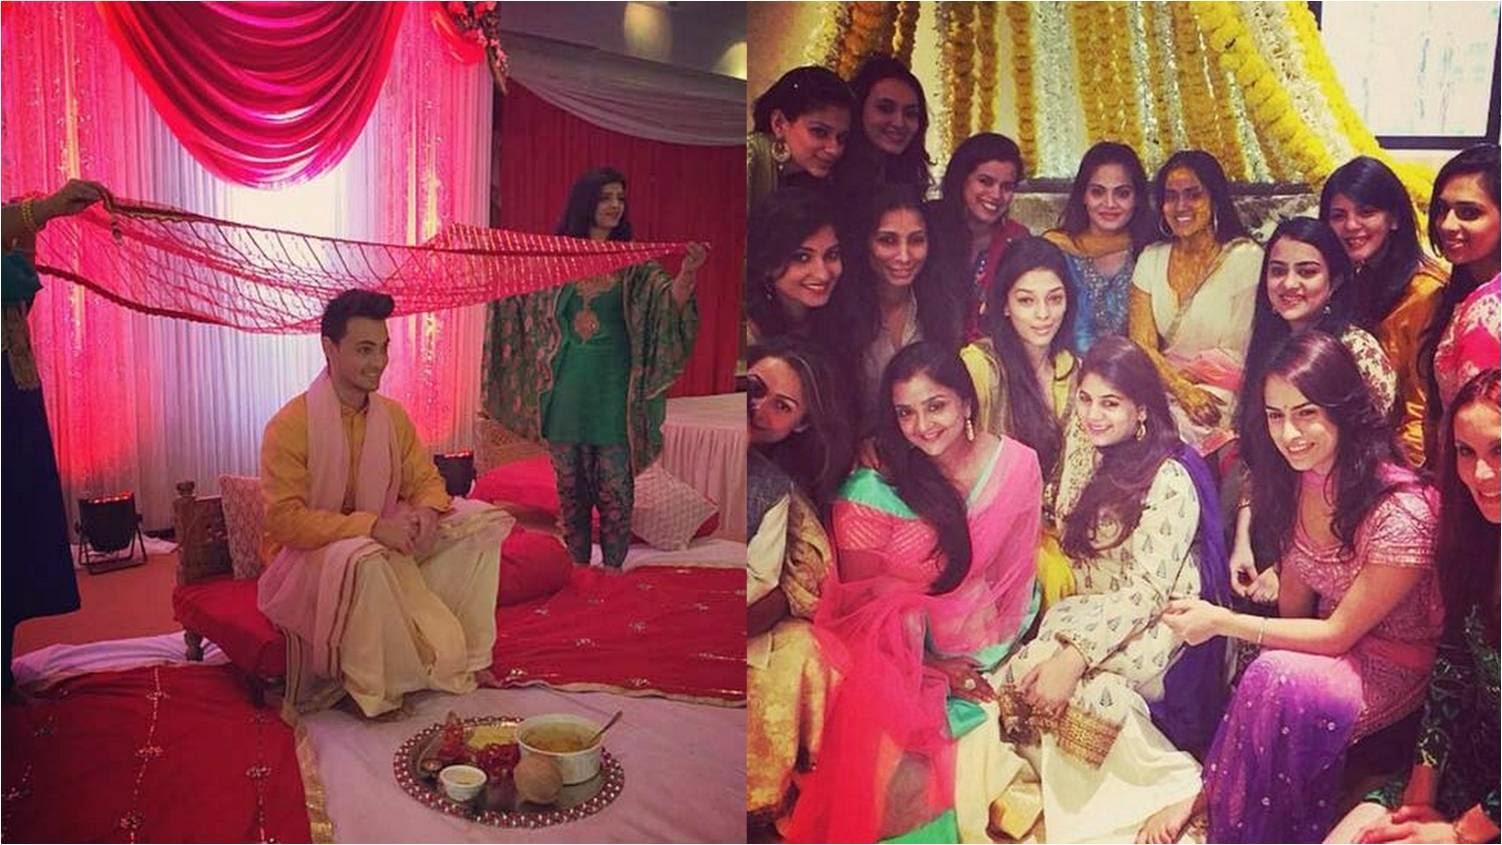 Aayush Sharma's wedding rituals: Arpita Khan's Haldi function